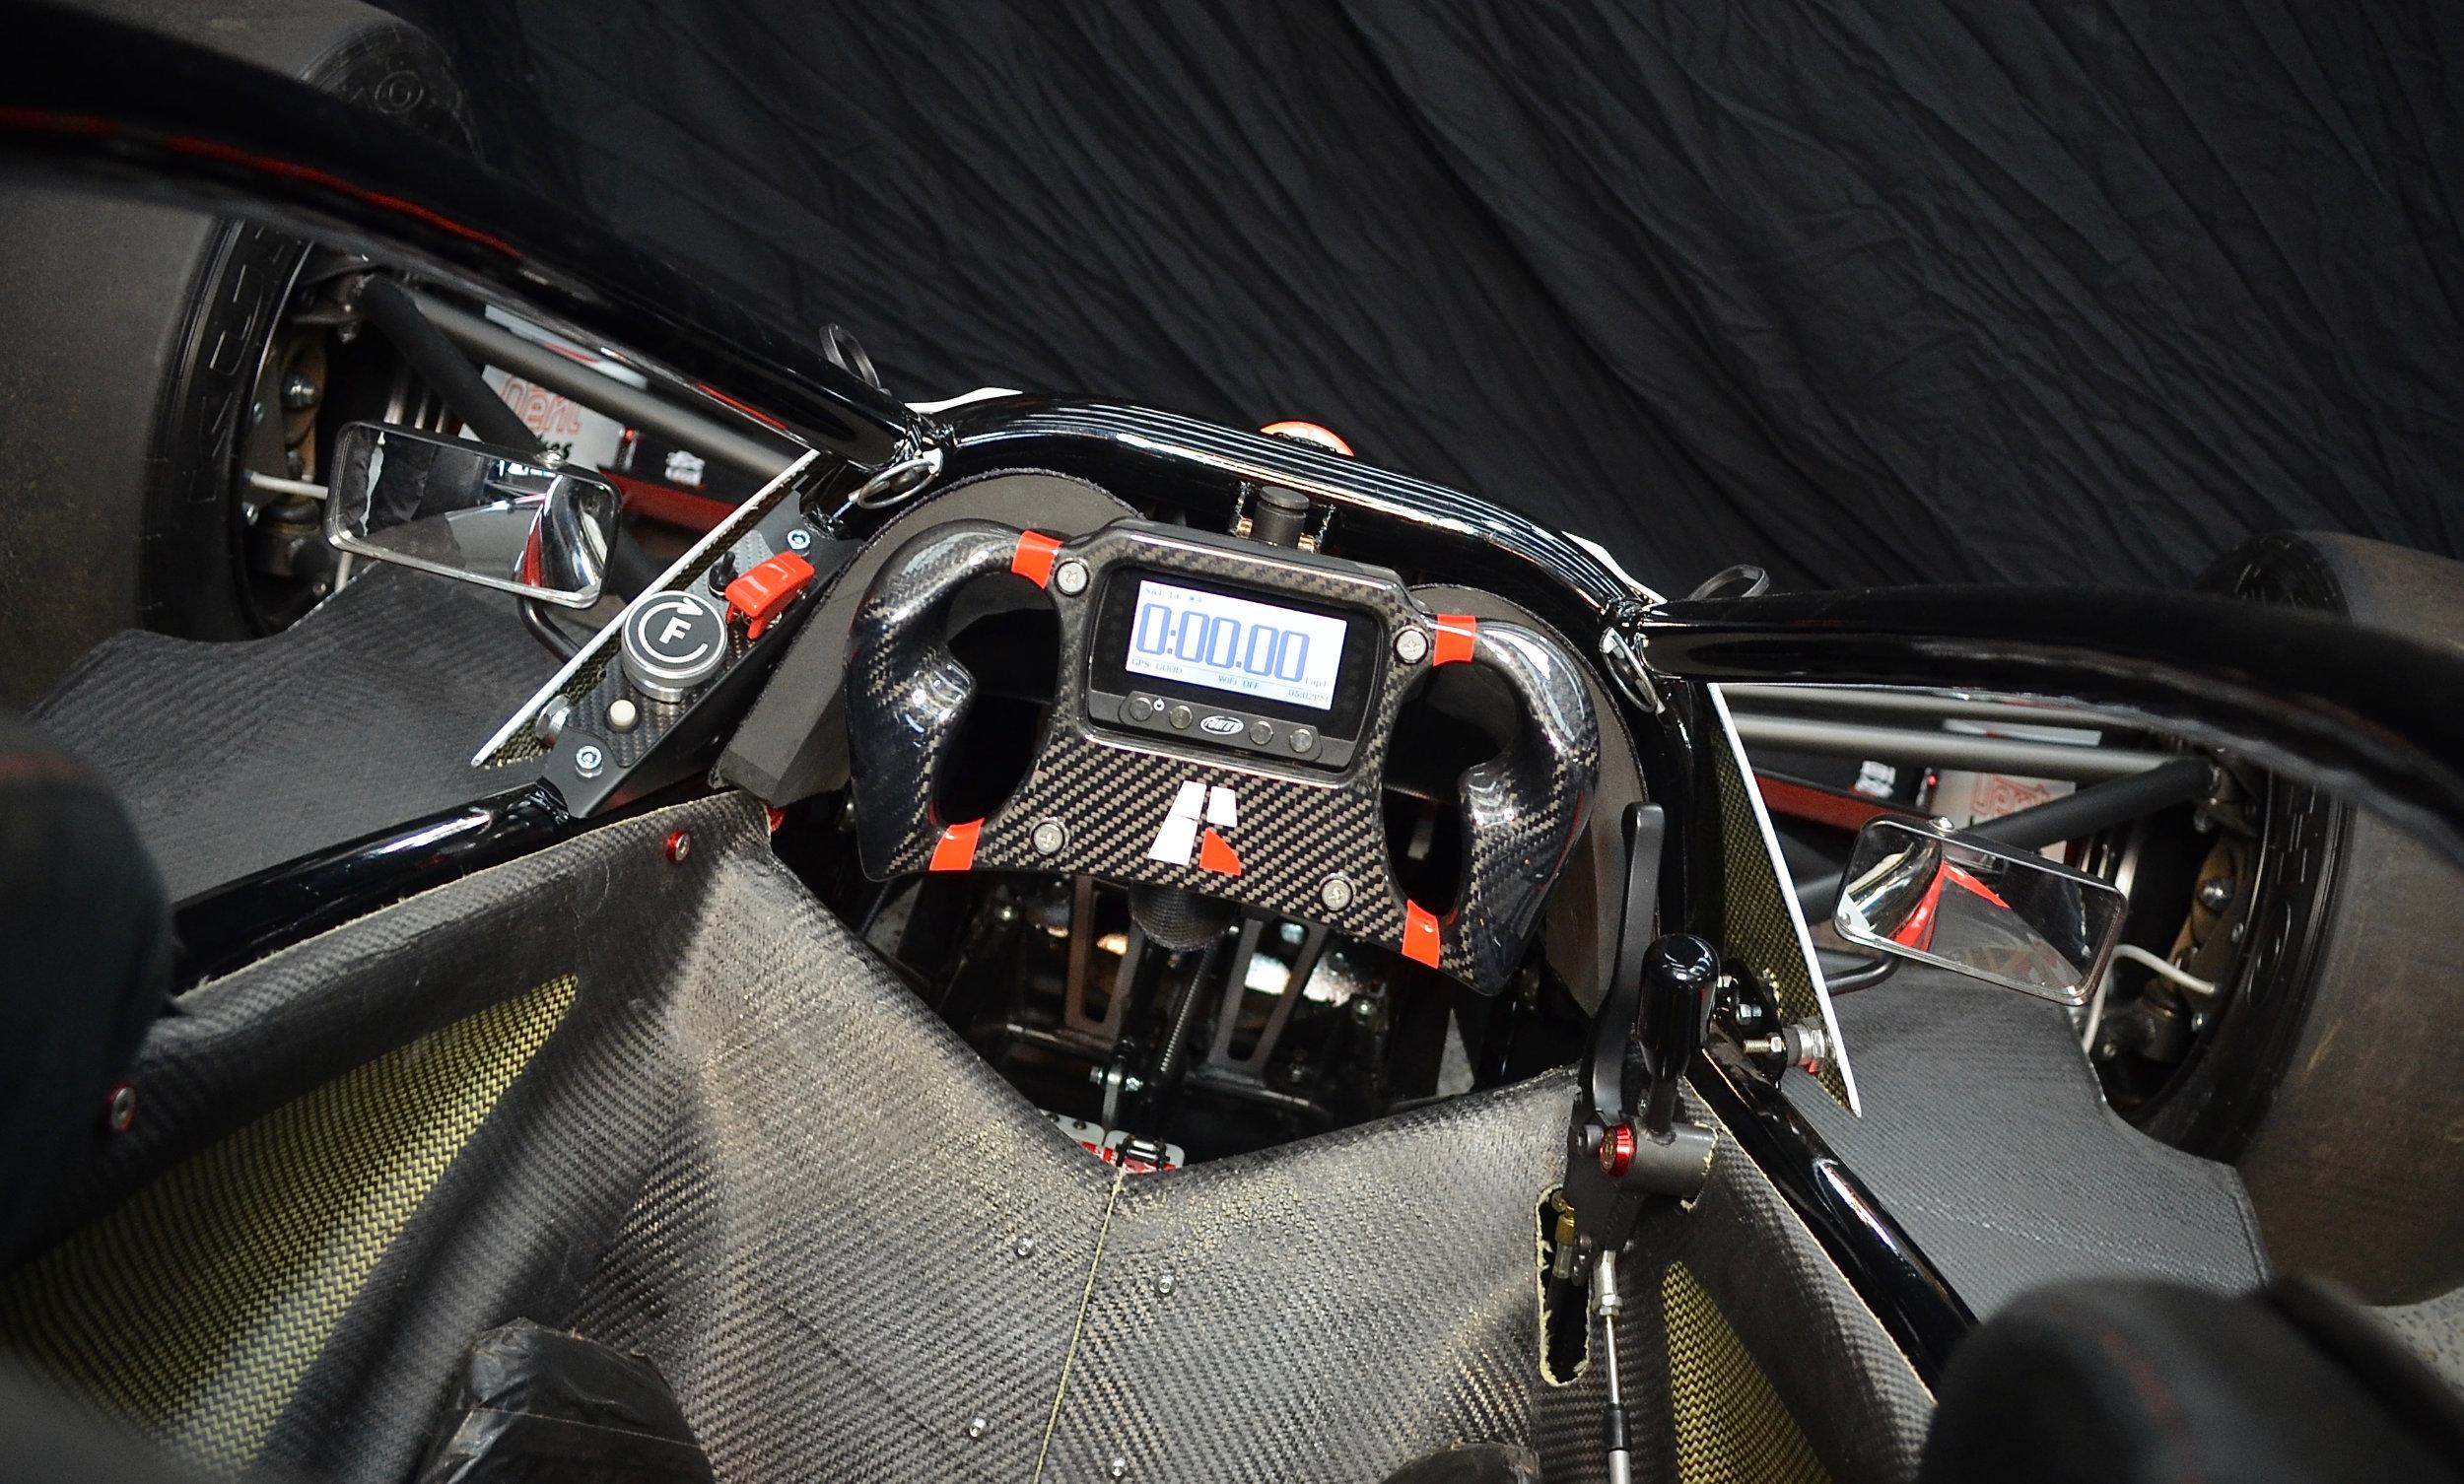 HyperX1Racer cockpit 2s